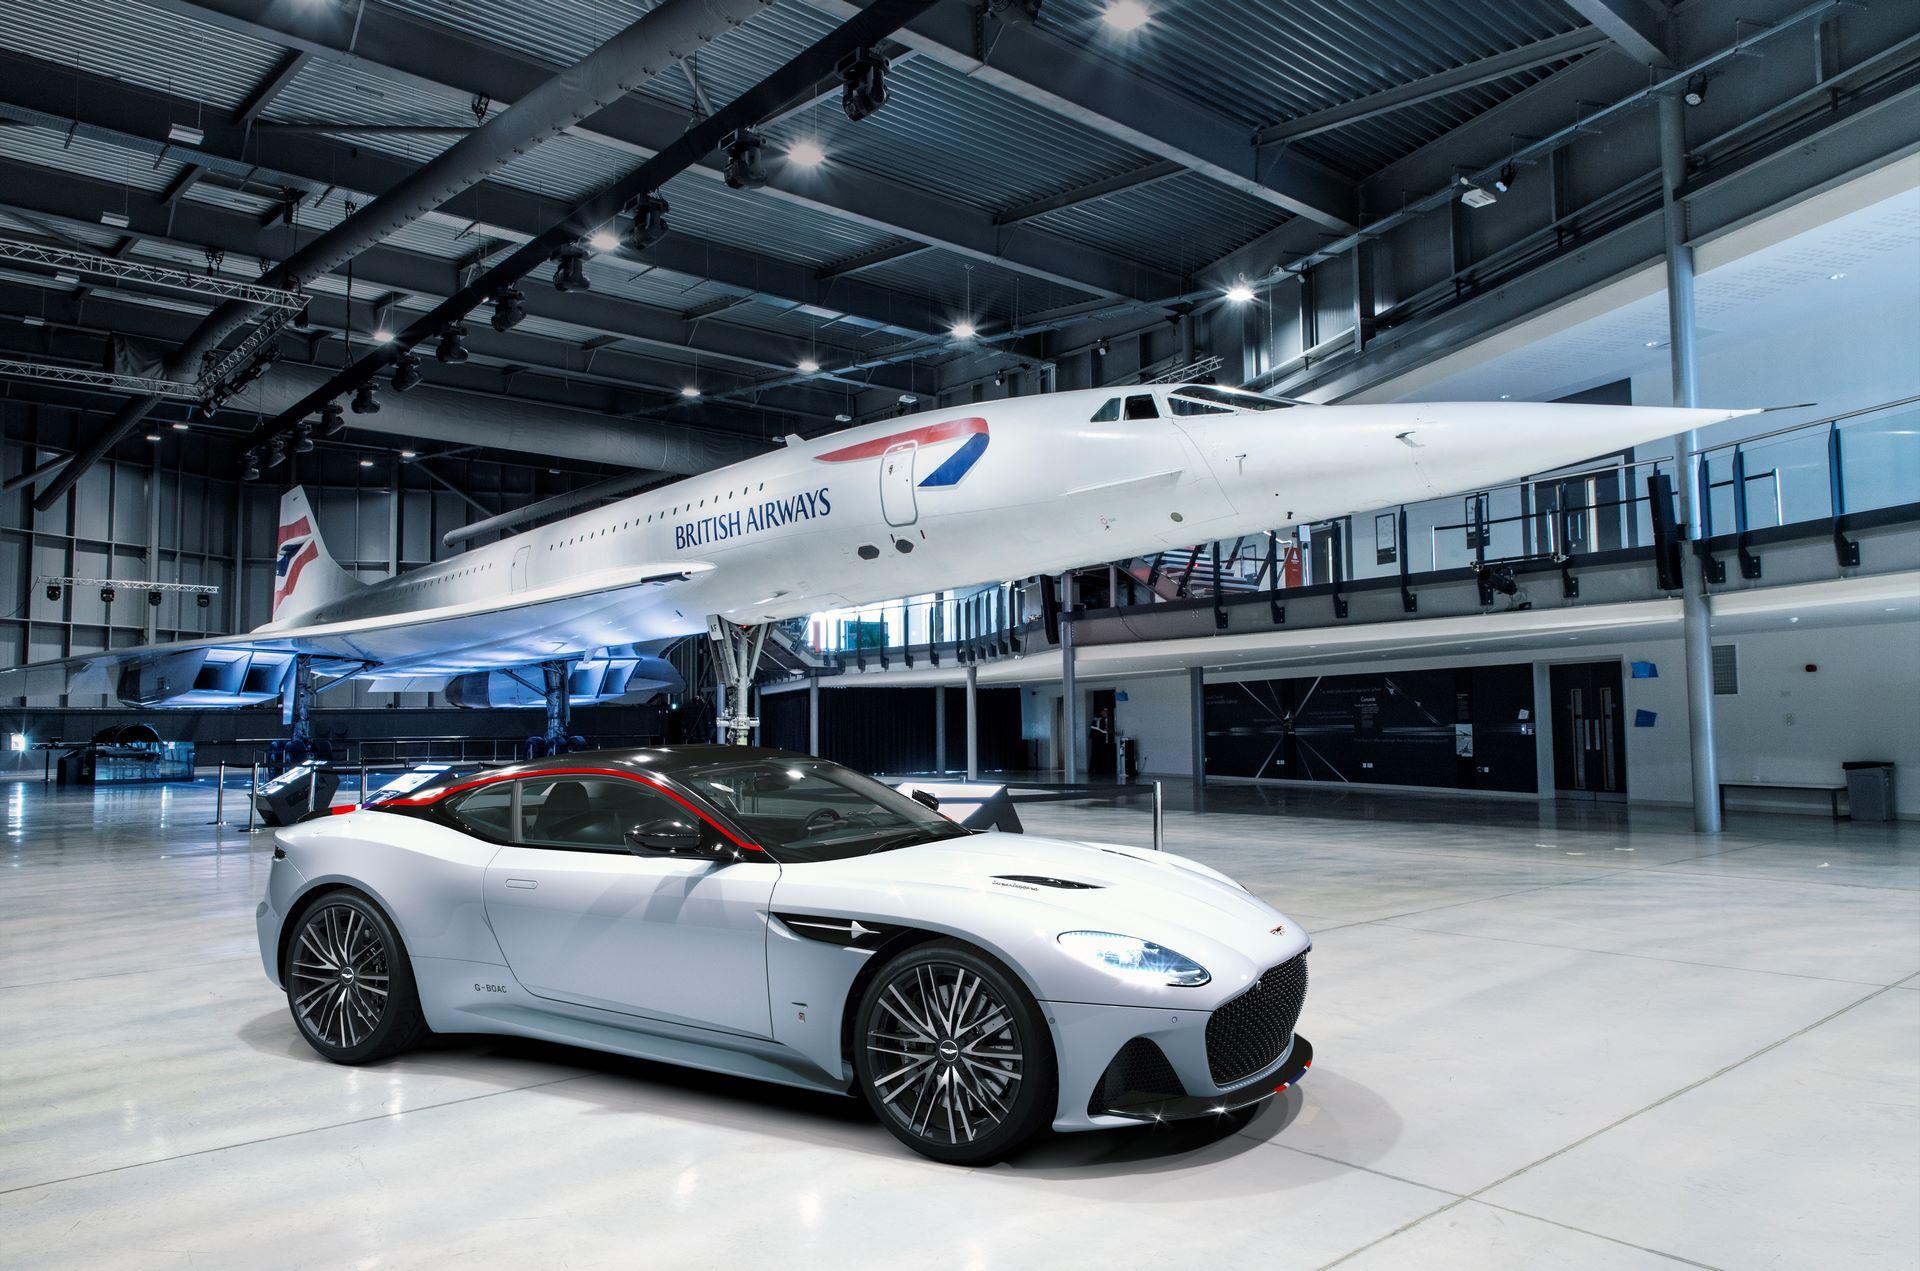 1_Aston-Martin-DBS-Superleggera-Concorde-Edition_01